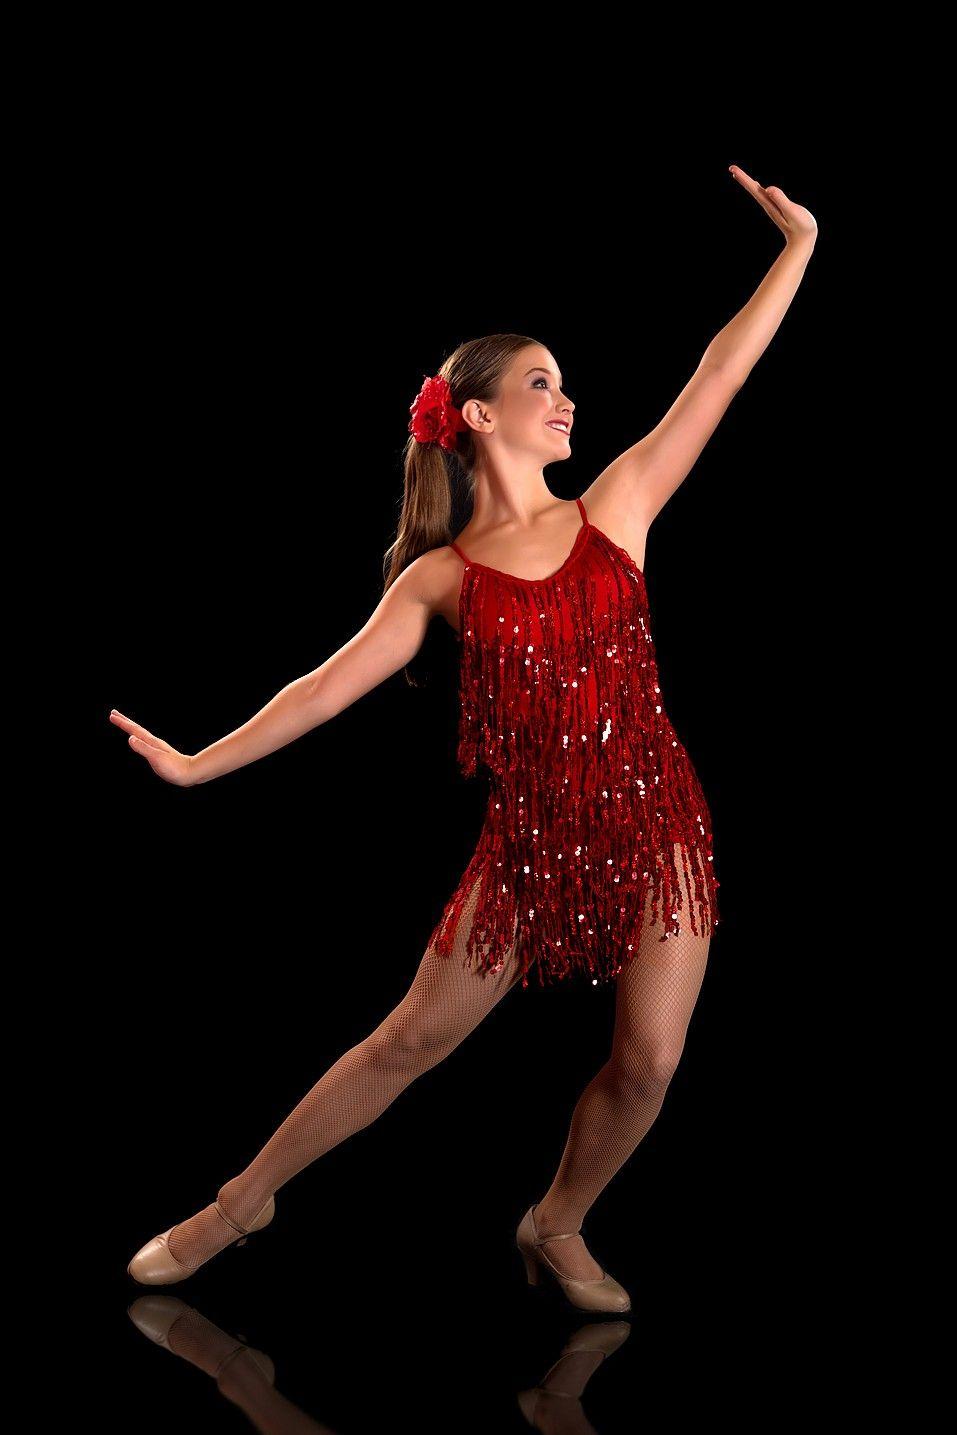 Dance Costume Roxy Red Dance Costumes Dance Costumes